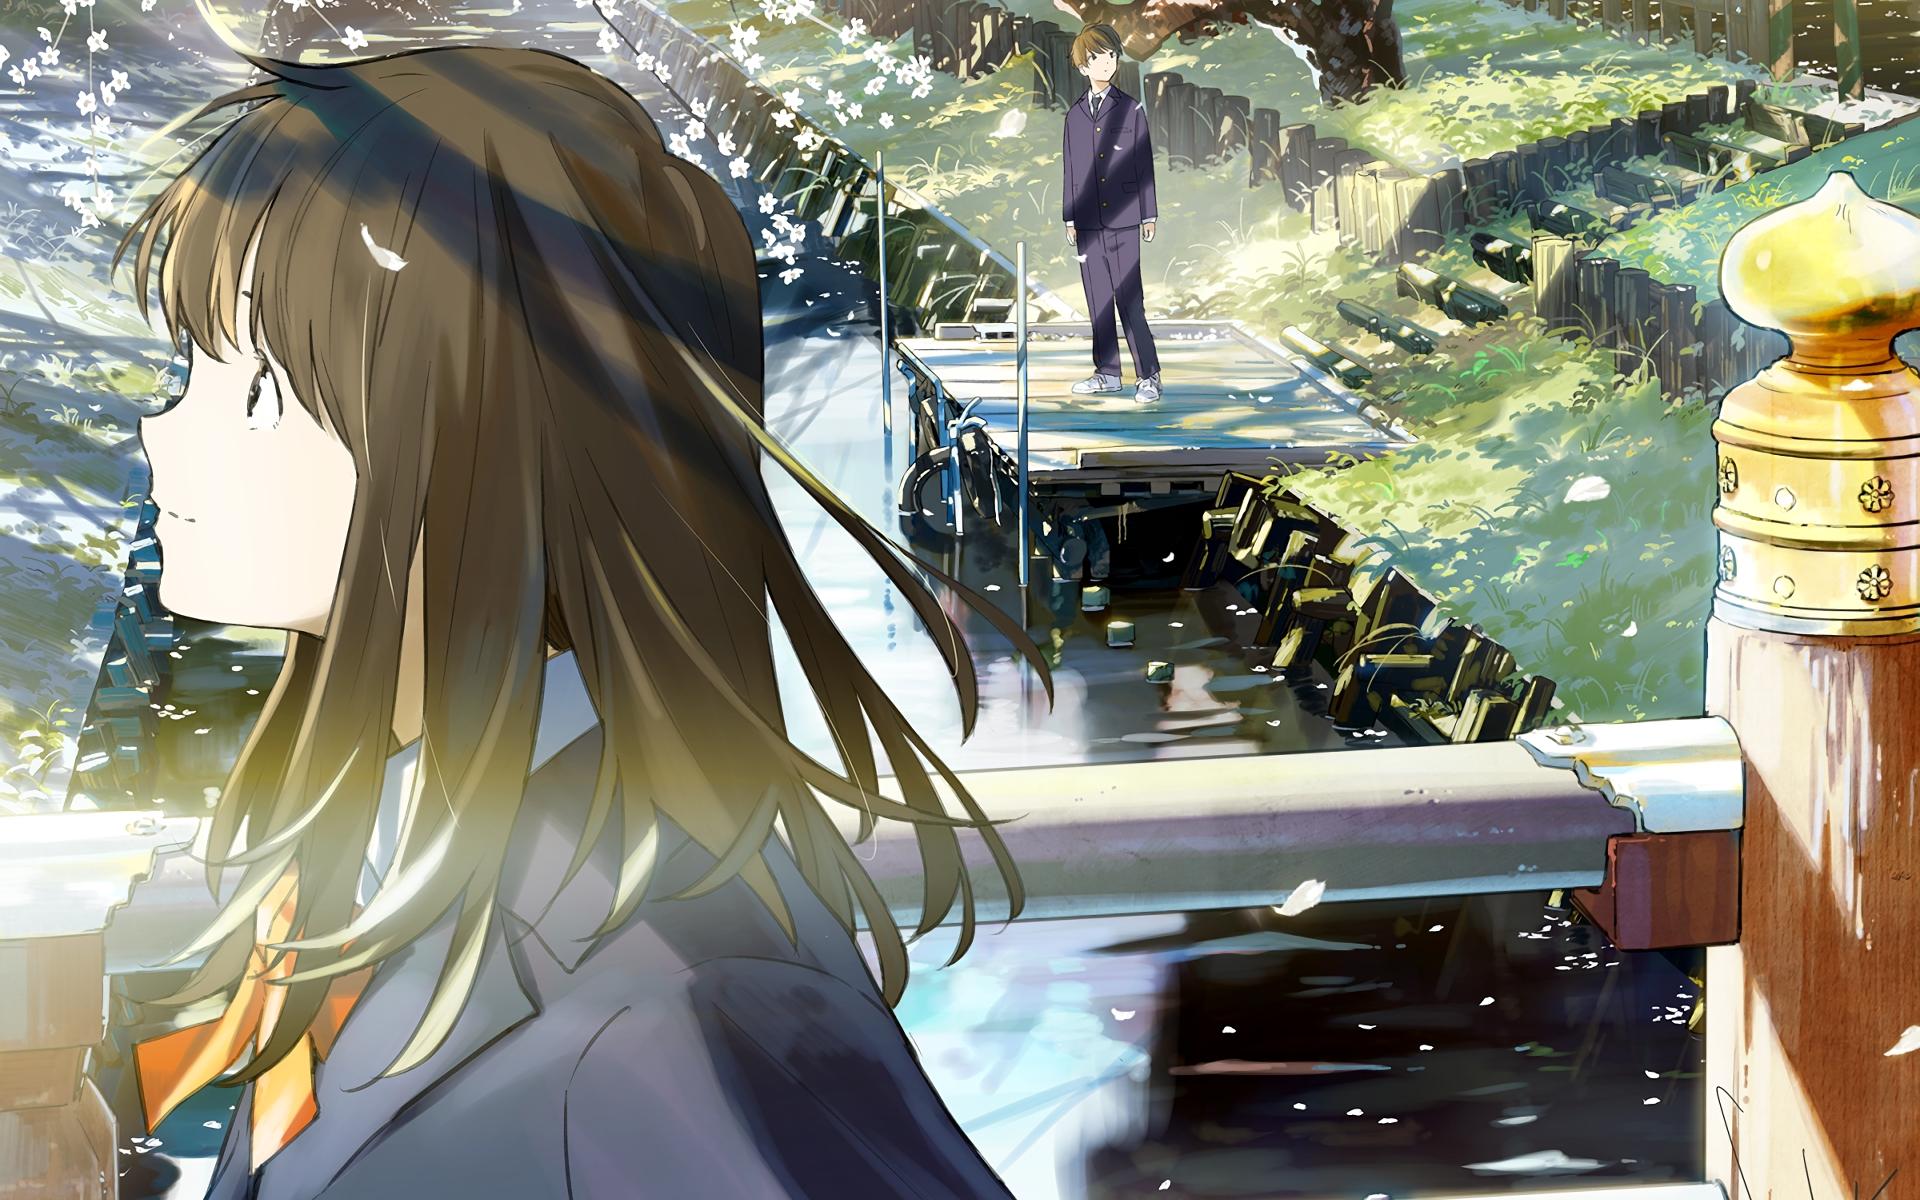 10 tsuki ga kirei hd wallpapers   background images - wallpaper abyss